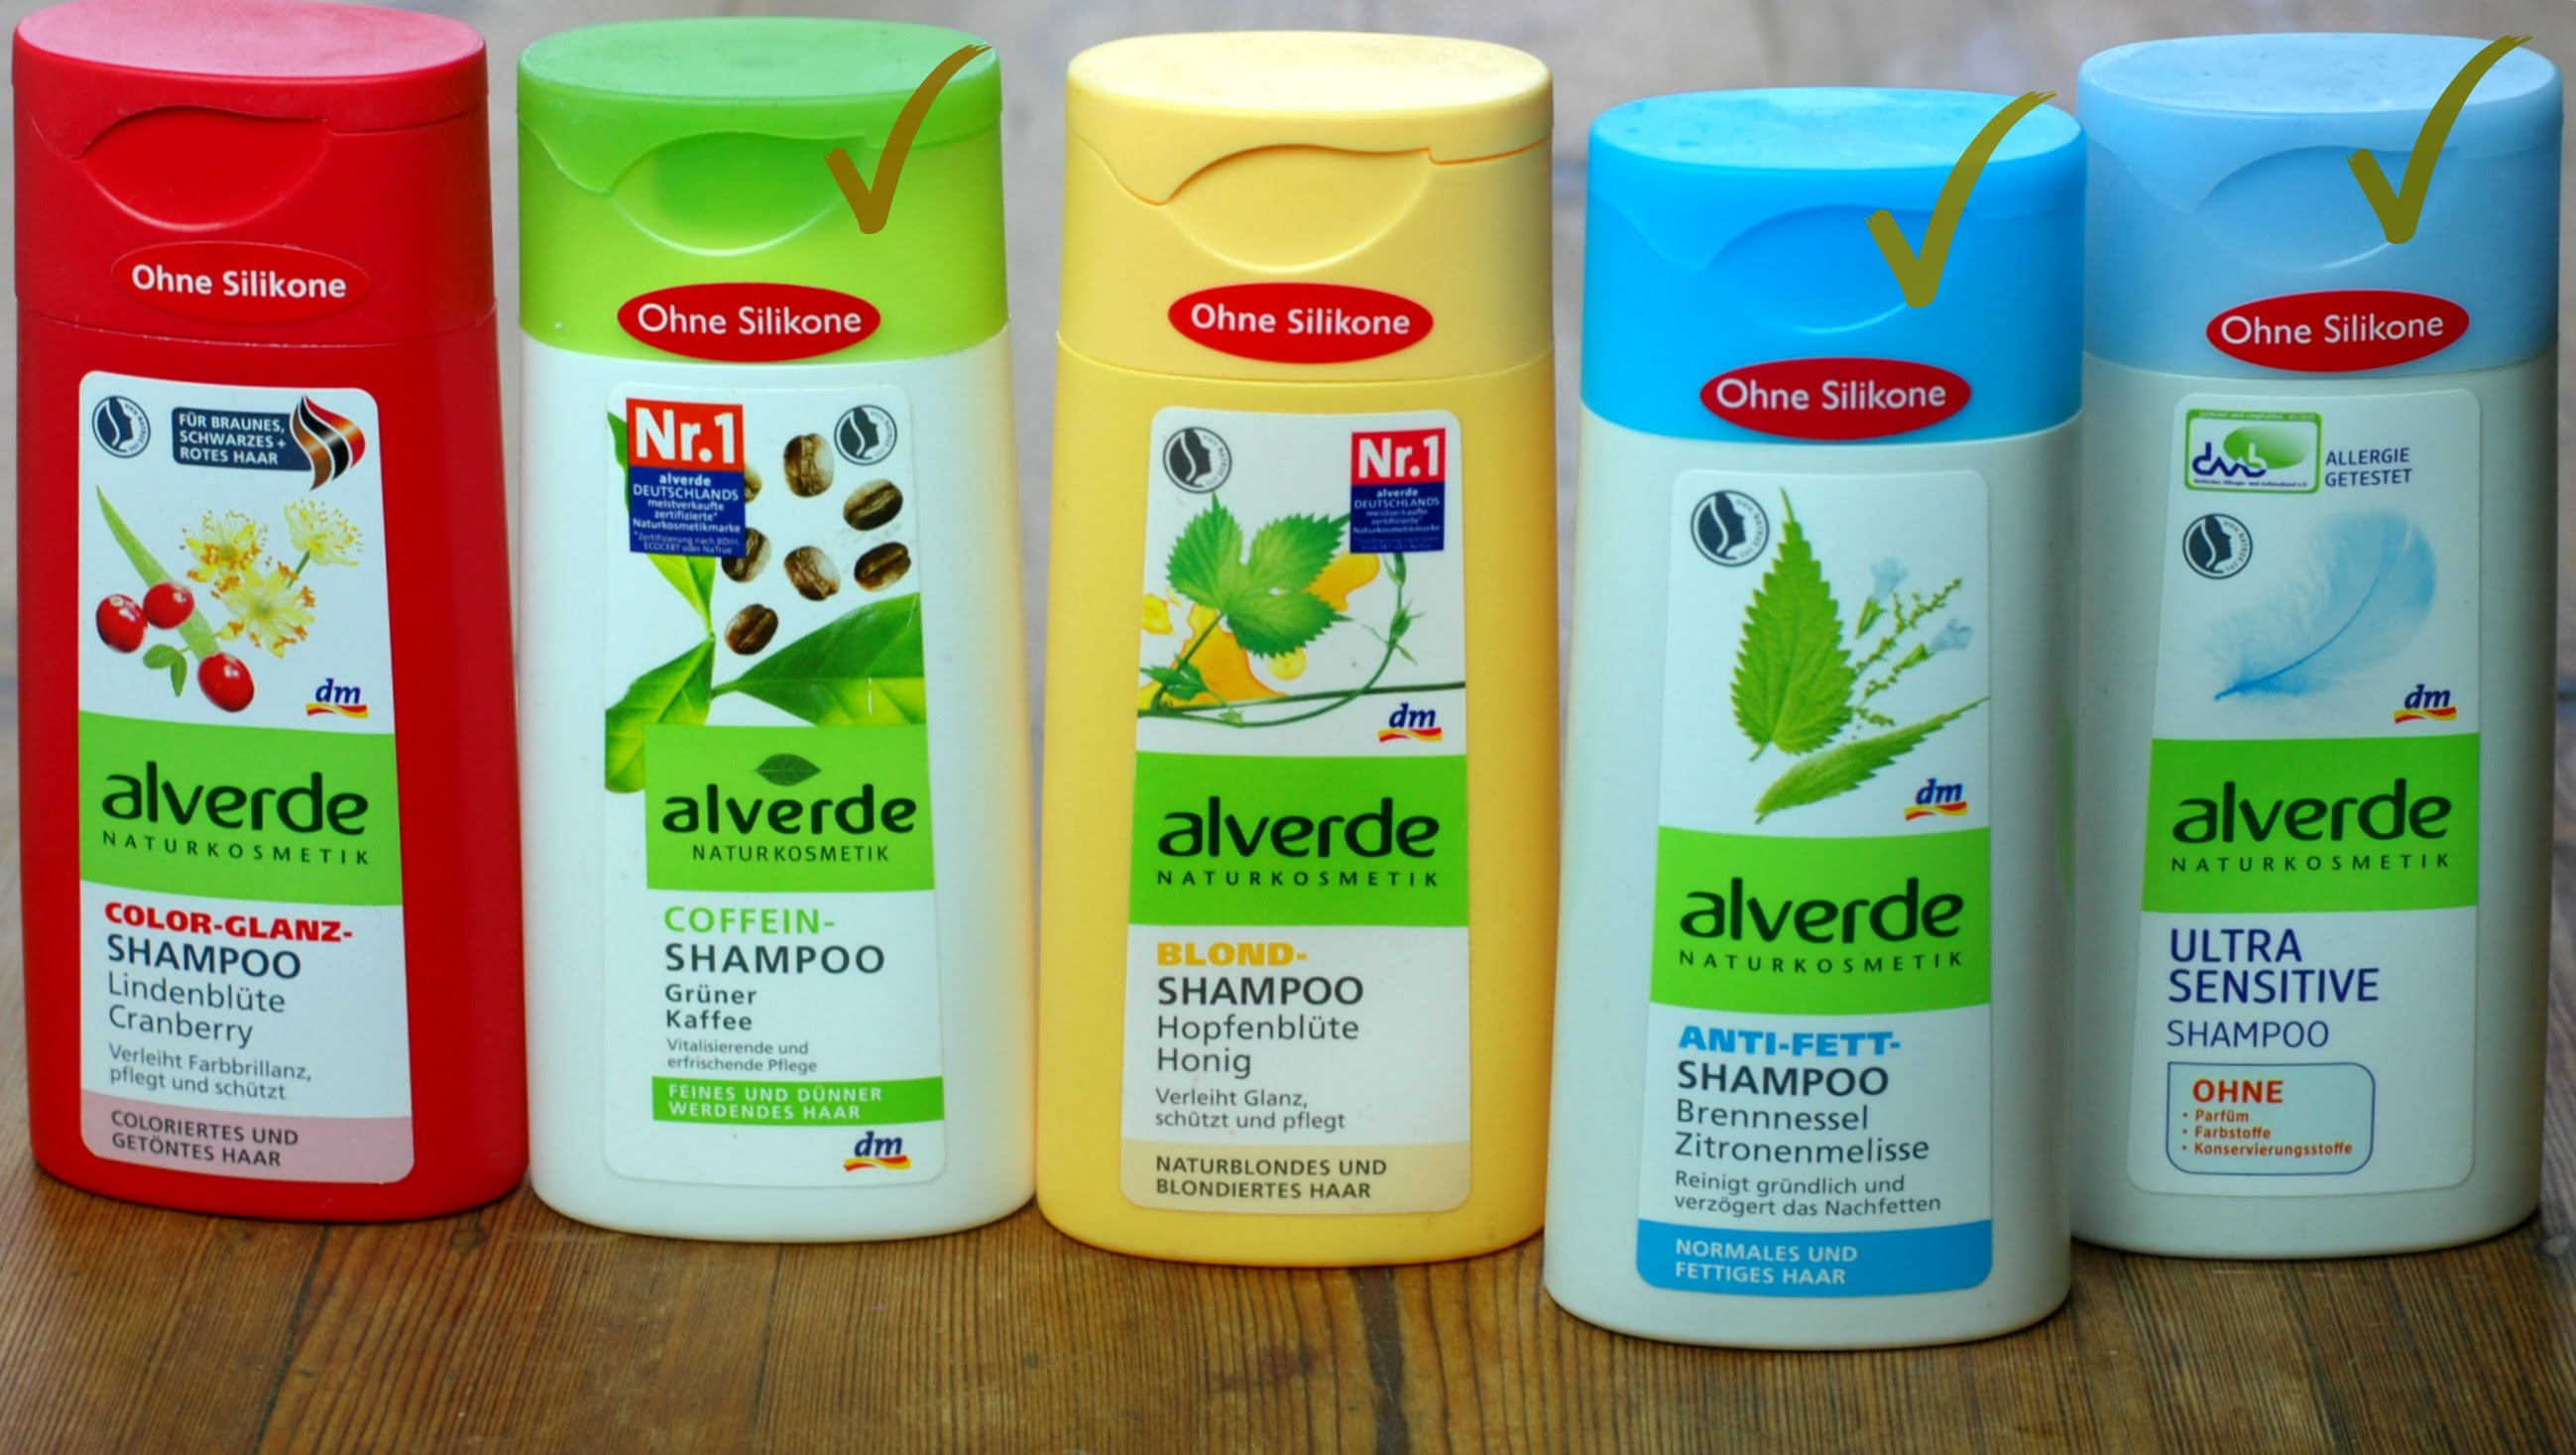 Alverde Anti Fett Shampoo Im Test Sanft Effektiv